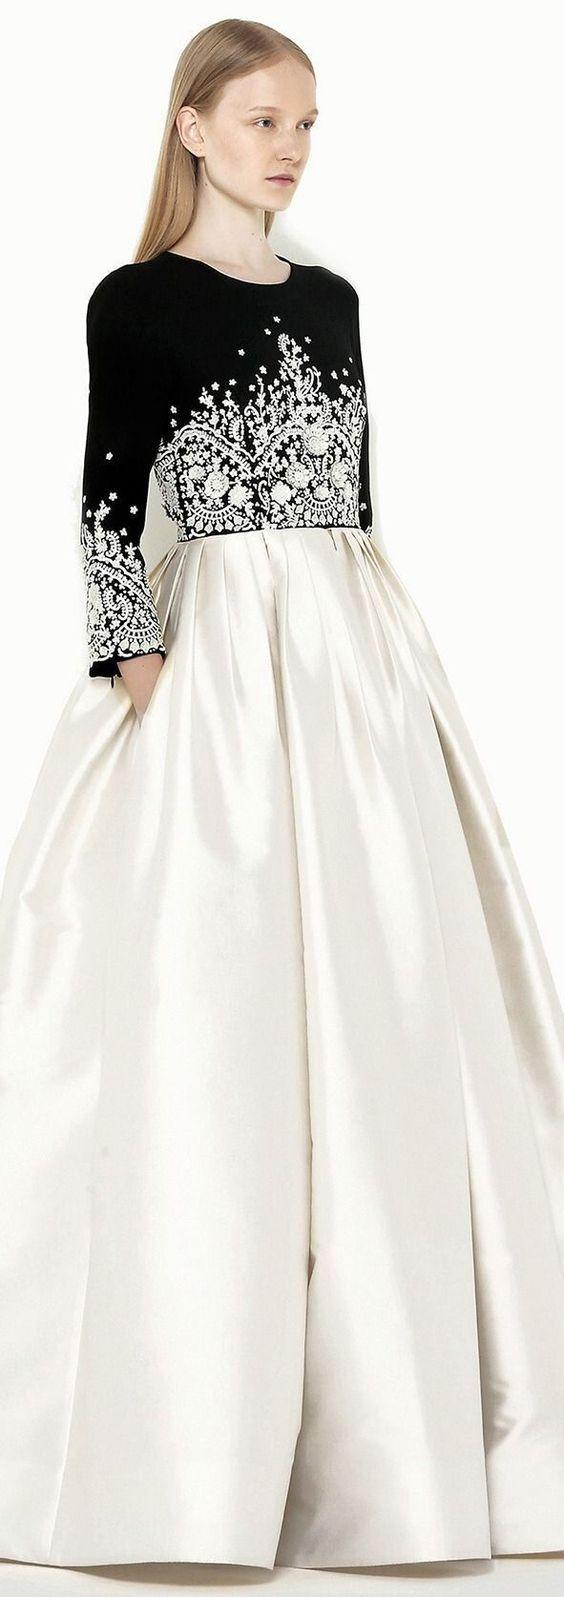 5e81afb7d4 Andrew Gn ~ Resort Elegance - White Embroidered Bodice over White w Ball  Room style White Skirt